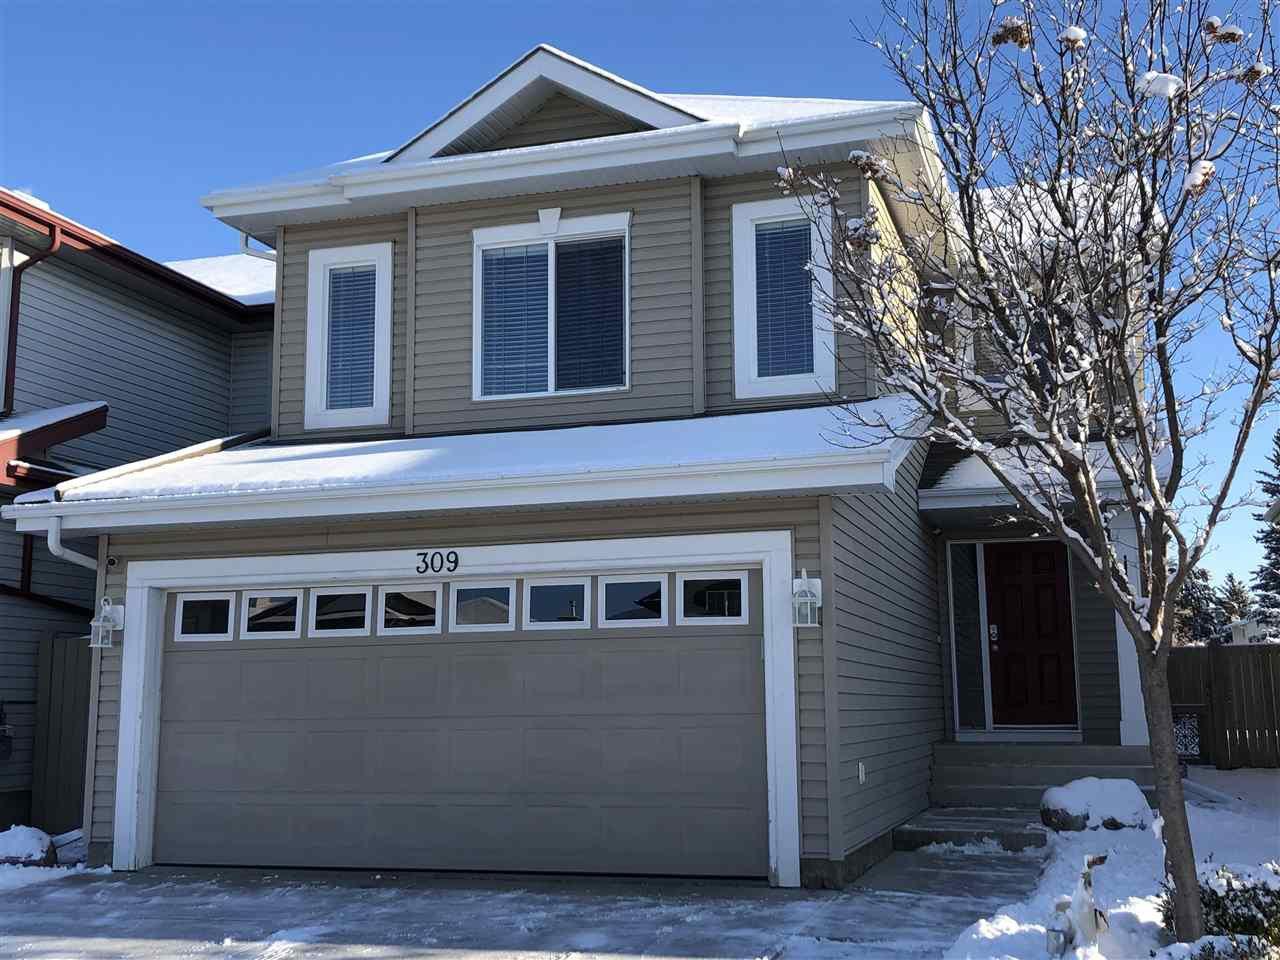 Main Photo: 309 79 Street in Edmonton: Zone 53 House for sale : MLS®# E4181703